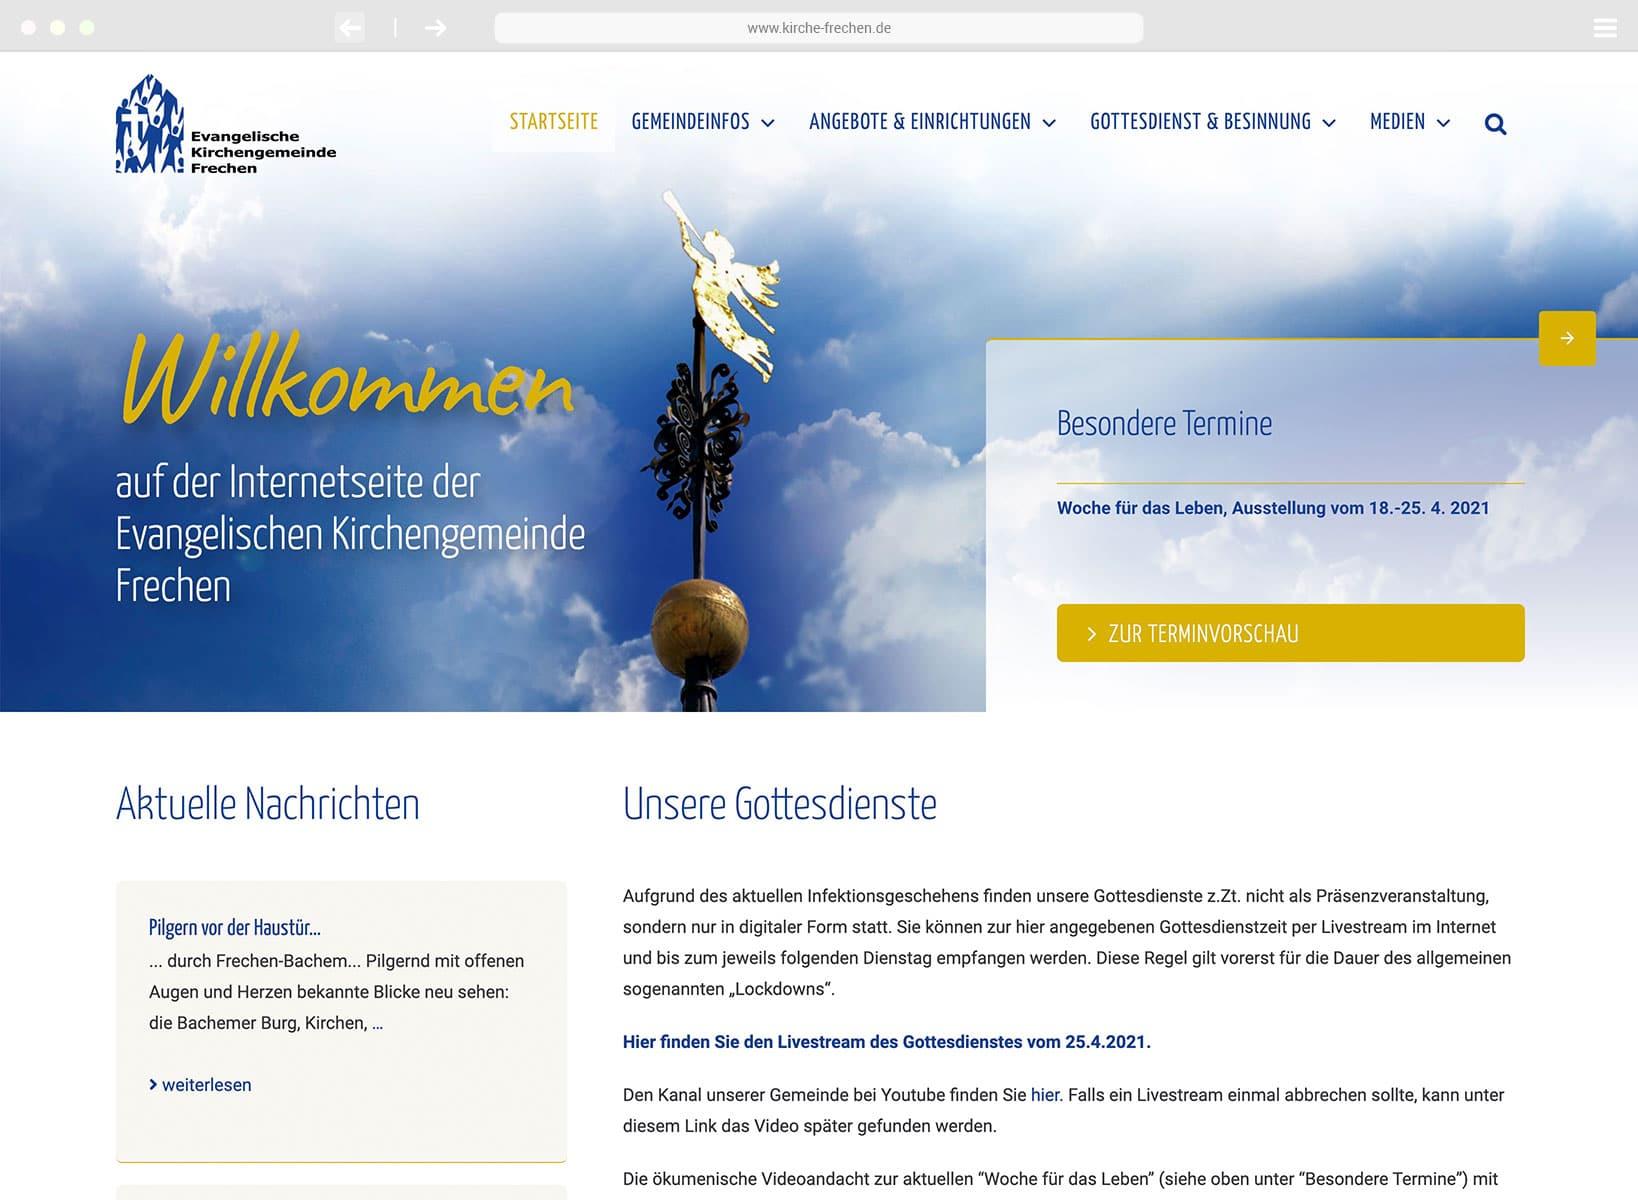 www.kirche-frechen.de